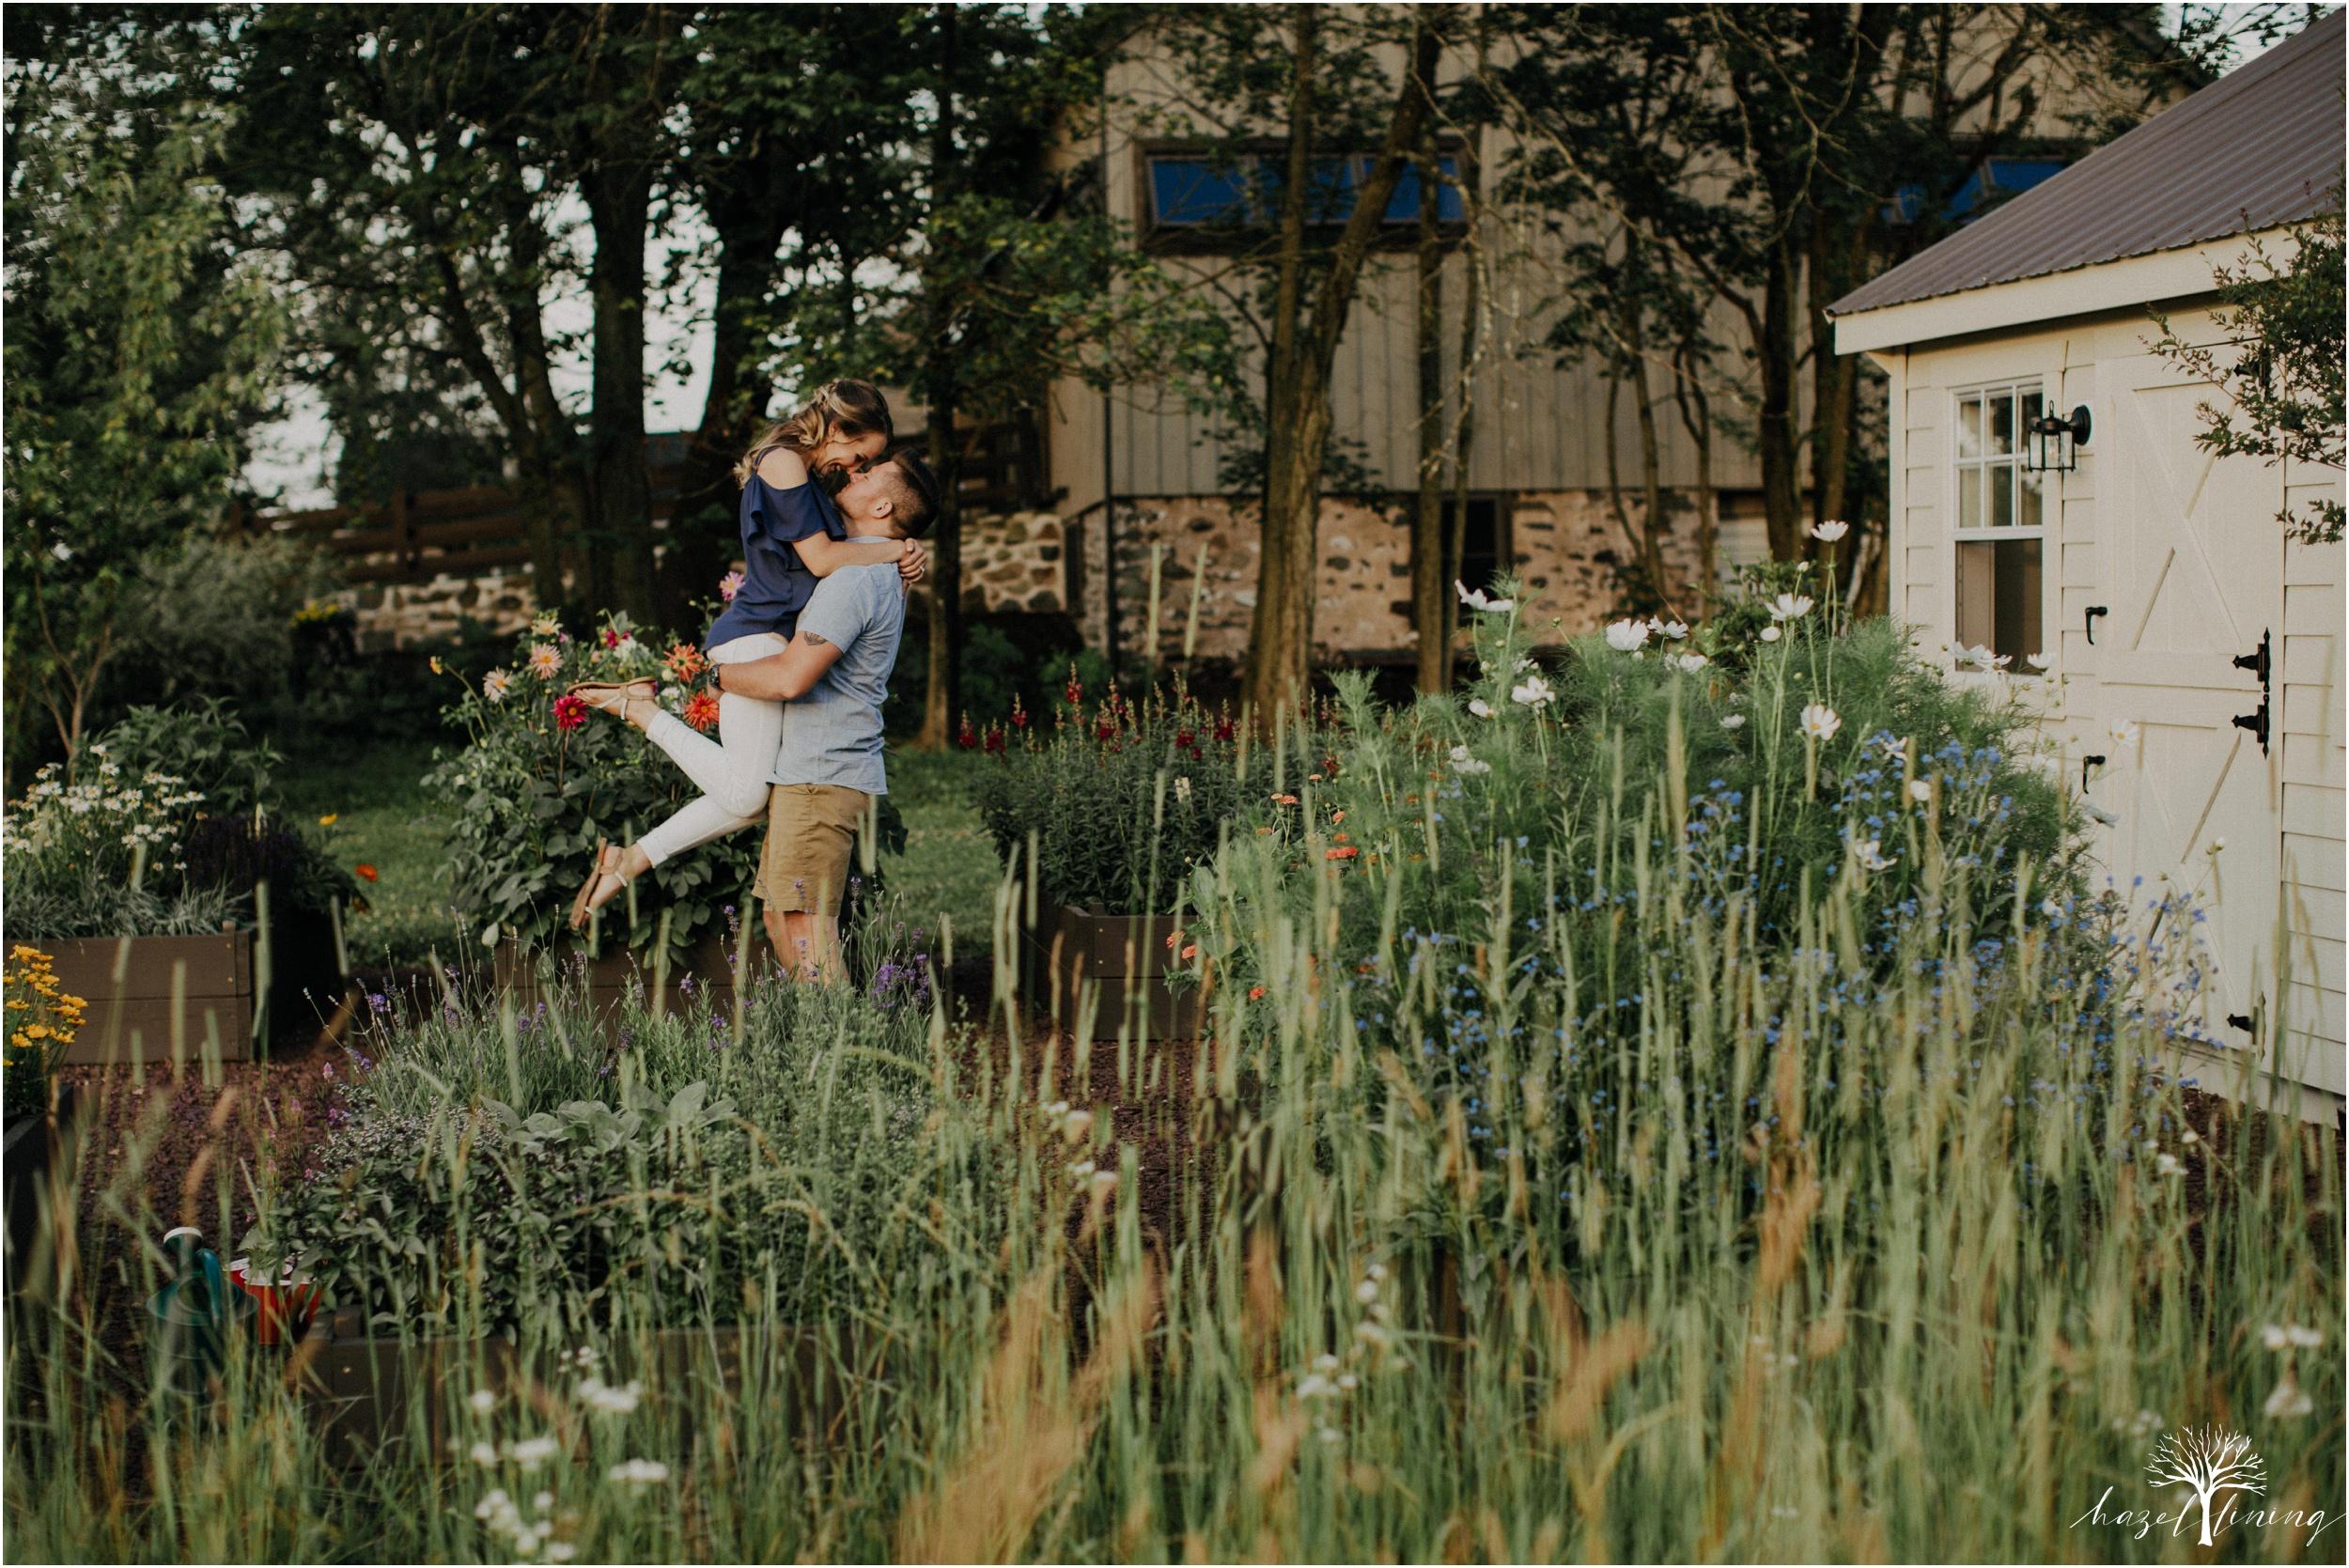 rachel-warner-chris-niedrist-the-farm-bakery-and-events-quakertown-pa-summer-engagement-hazel-lining-photography-destination-elopement-wedding-engagement-photography_0059.jpg